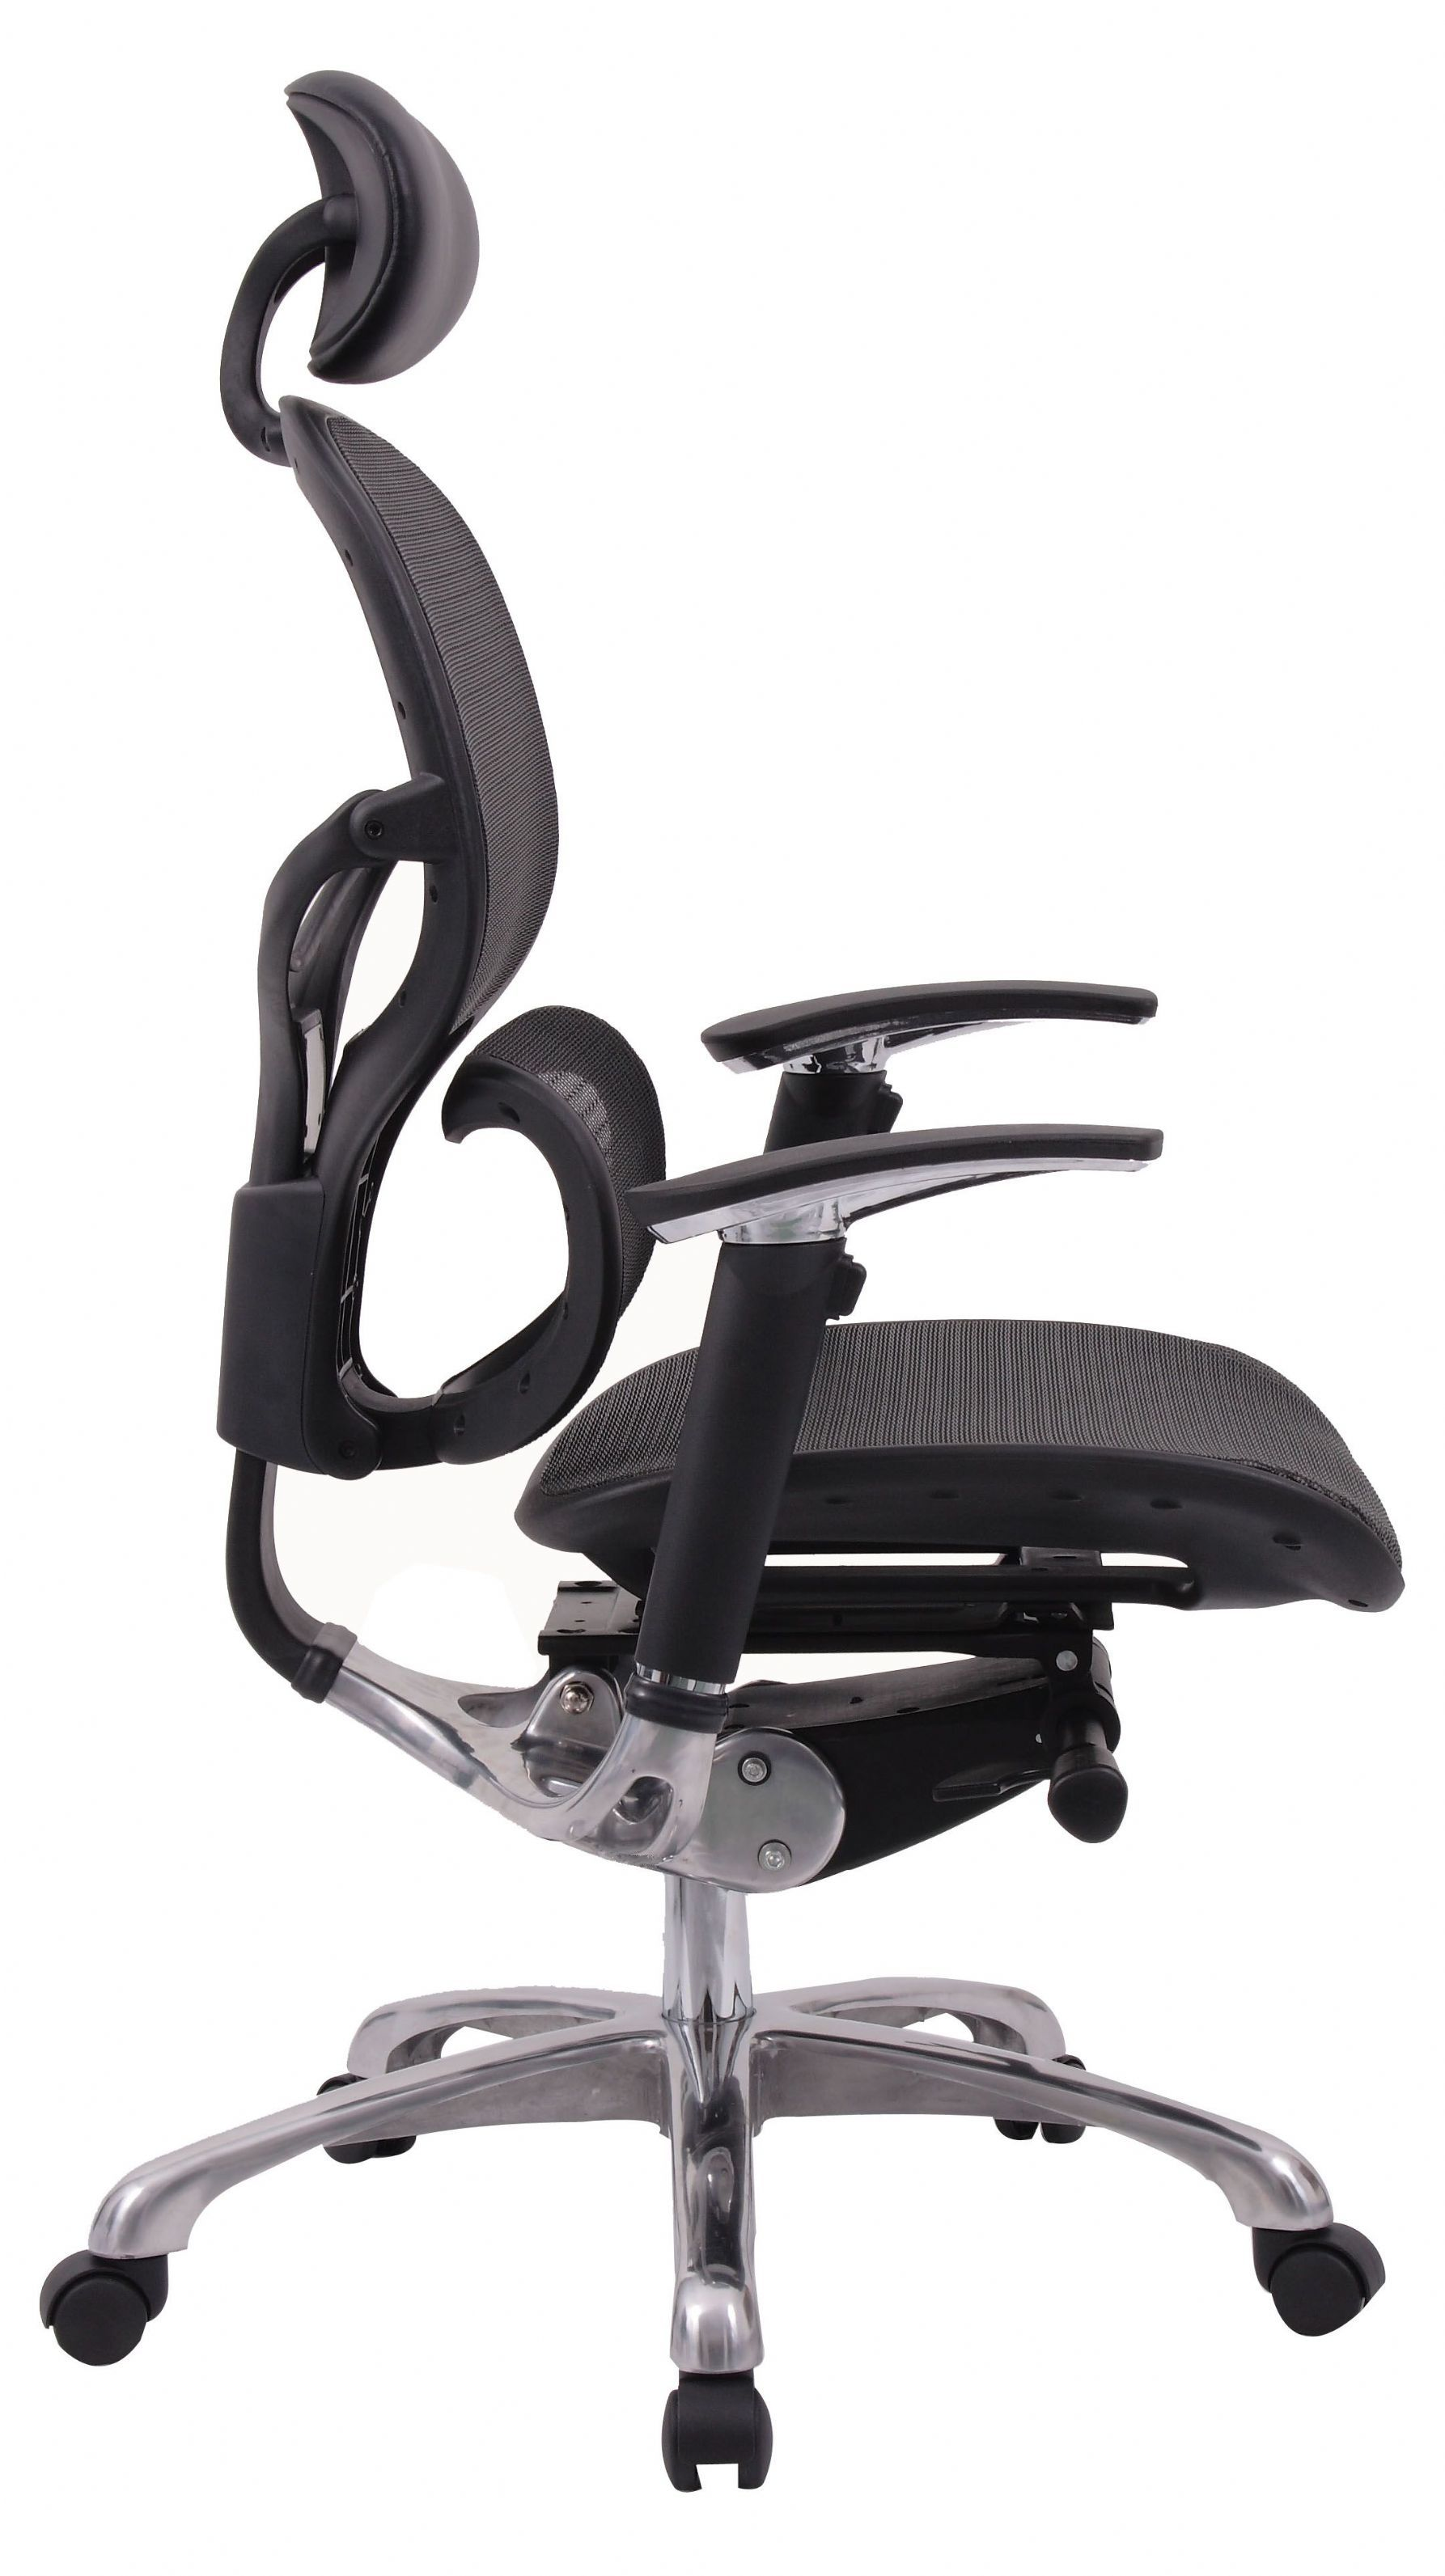 Ergonomic Desk Chair With Lumbar Support Best Office Chair Best